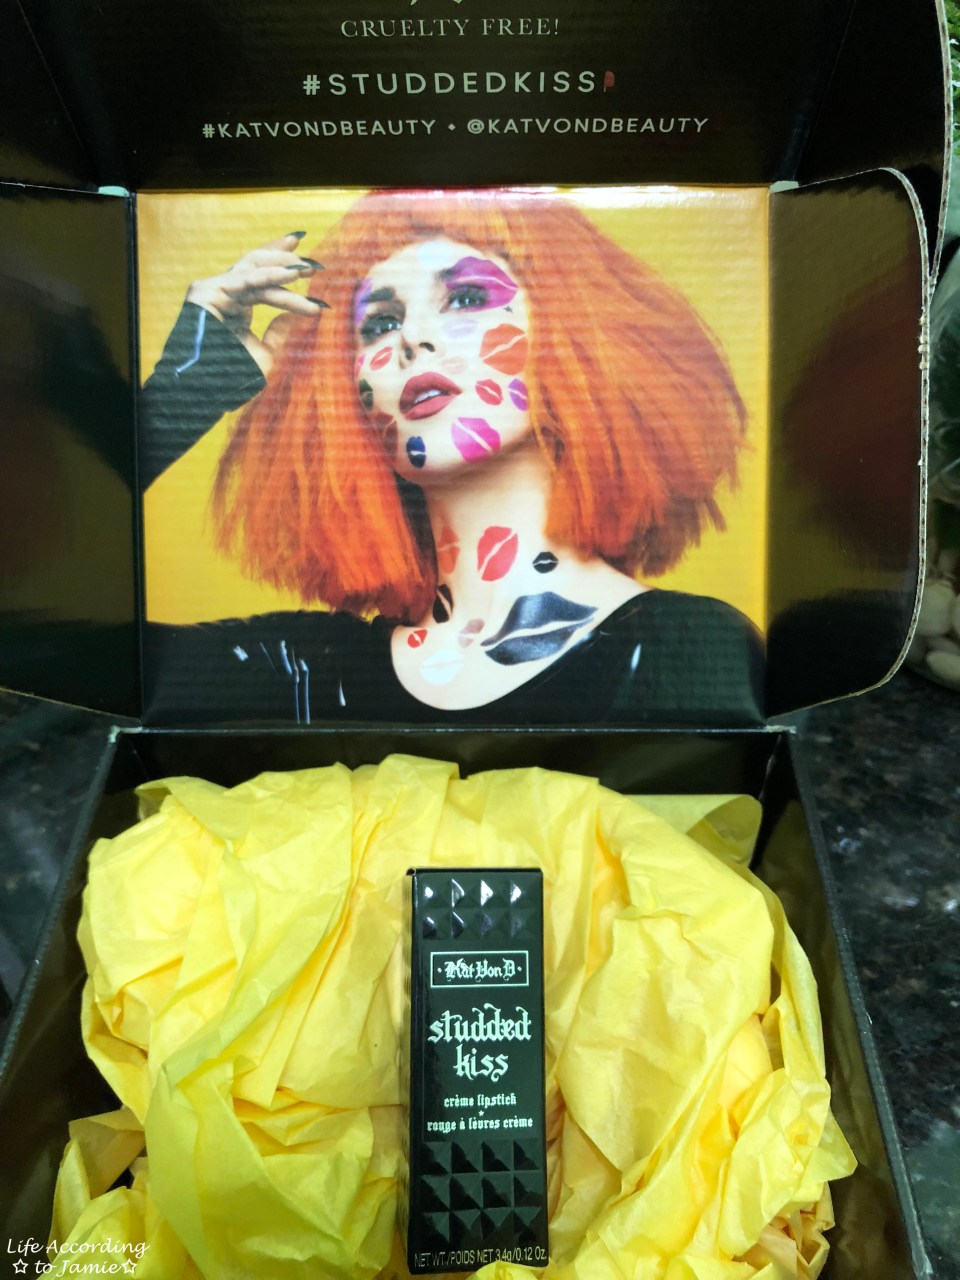 Kat Von D - Studded Kiss Creme Lipstick 1